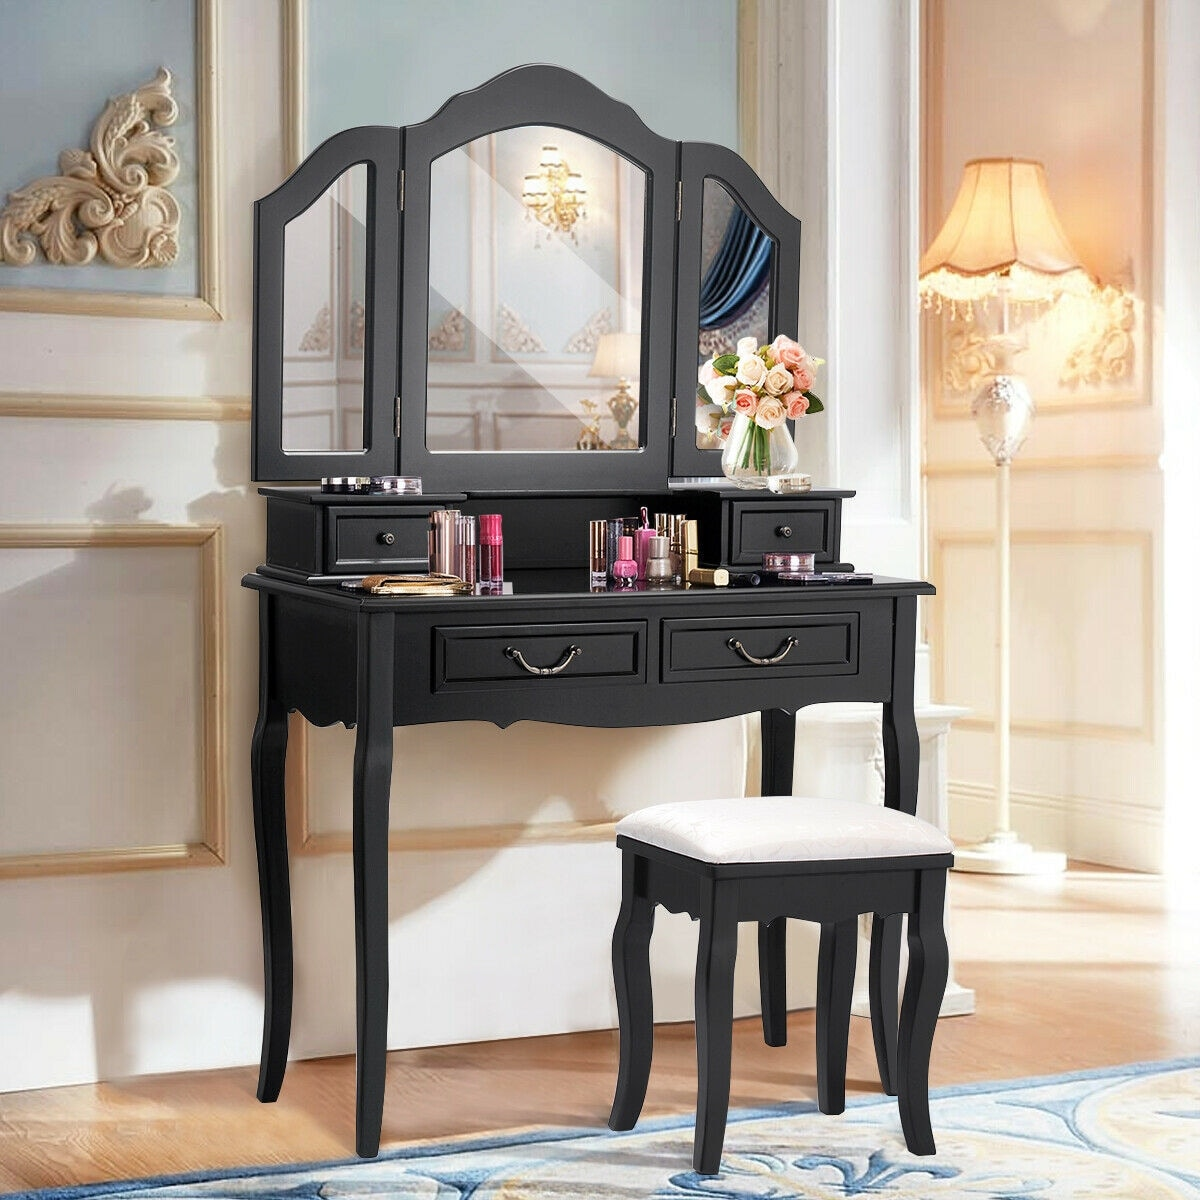 Vanity Furniture Shop Our Best Home Goods Deals Online At